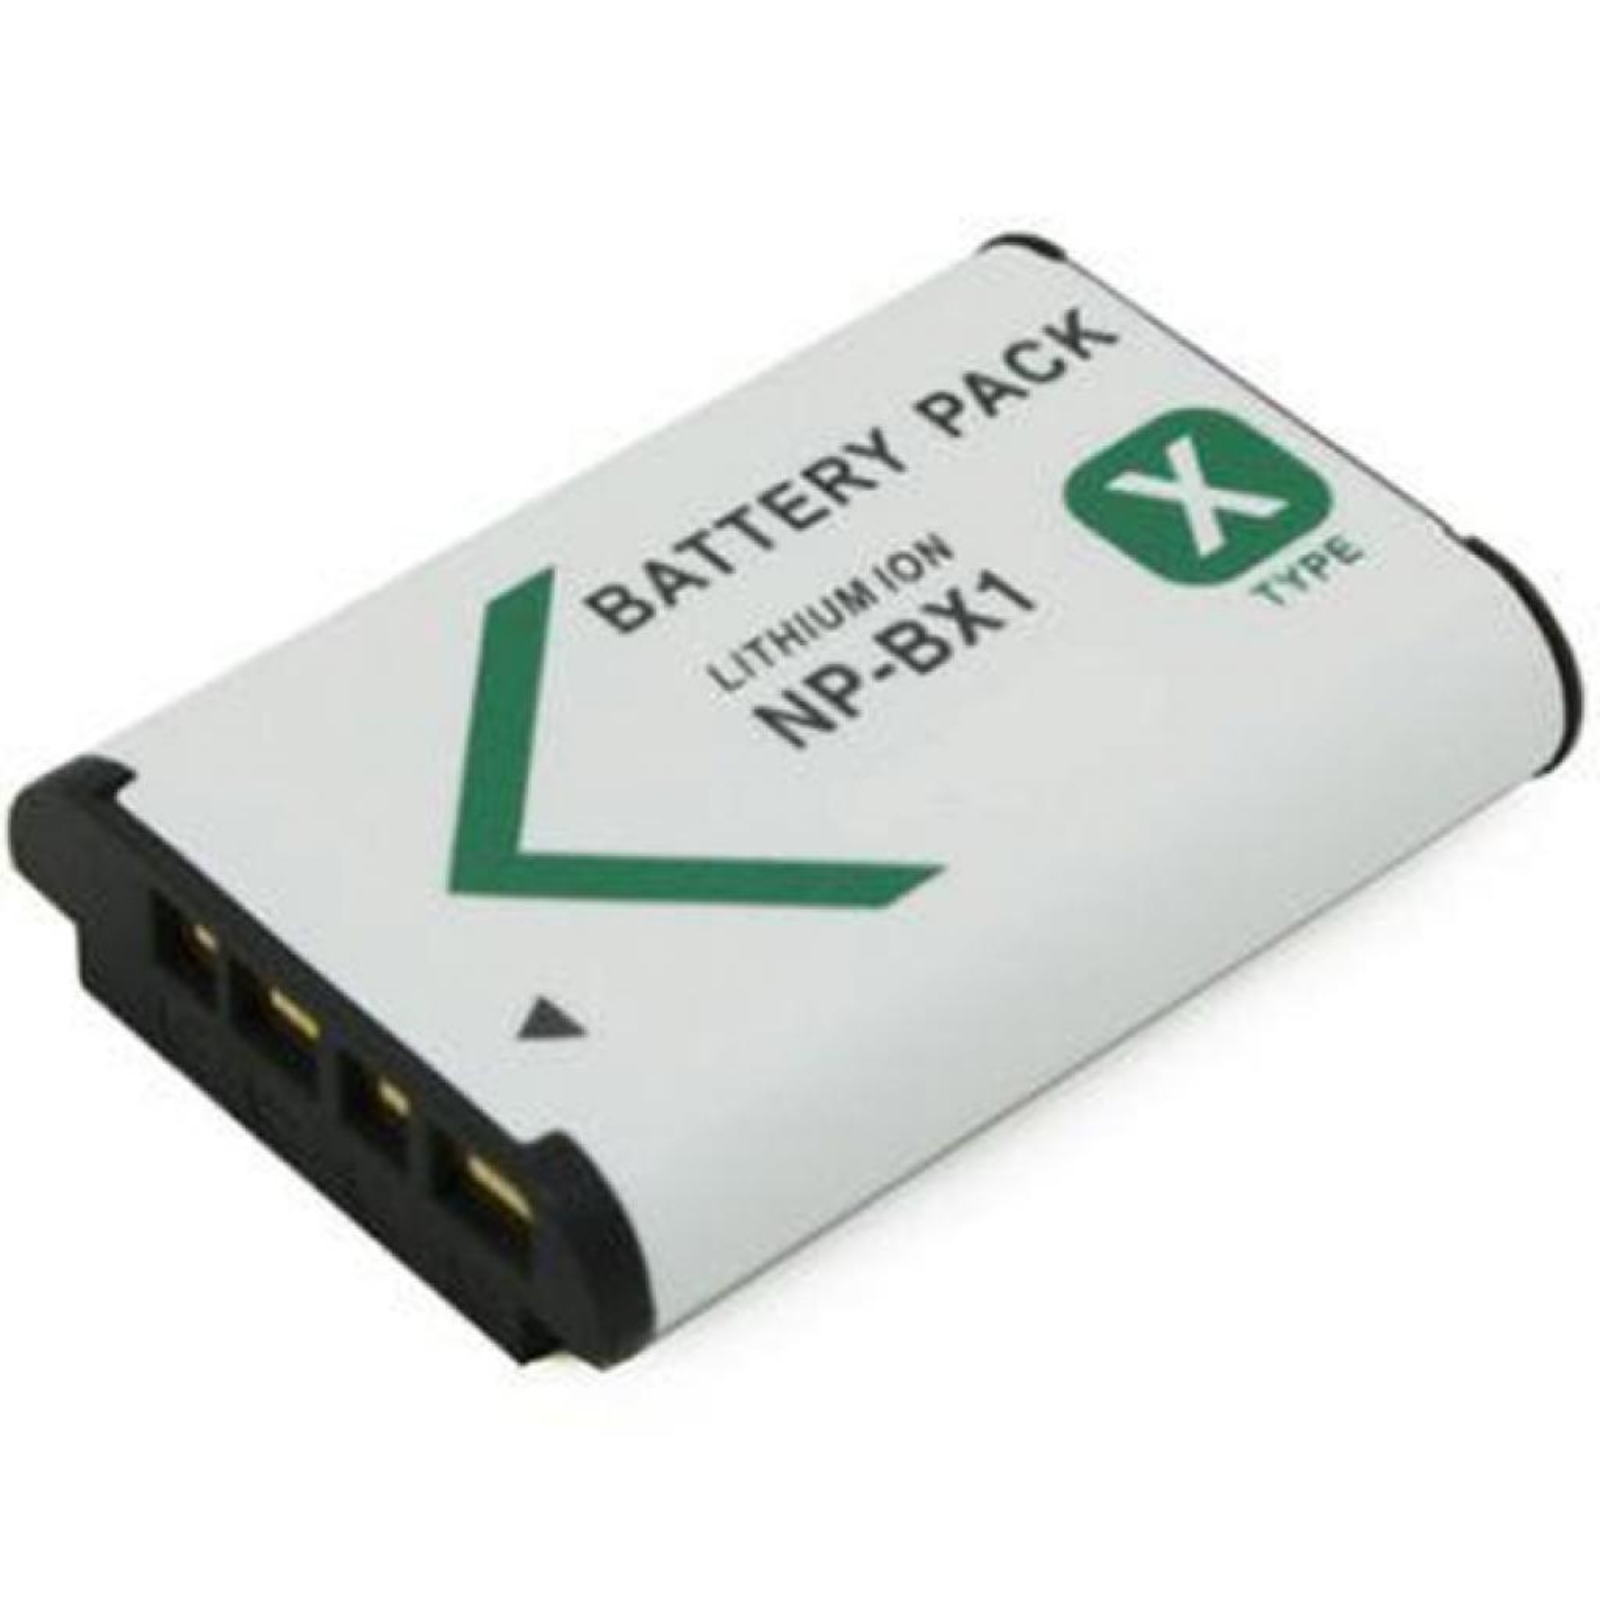 Аккумулятор к фото/видео PowerPlant Sony NP-BX1 (DV00DV1308) изображение 2